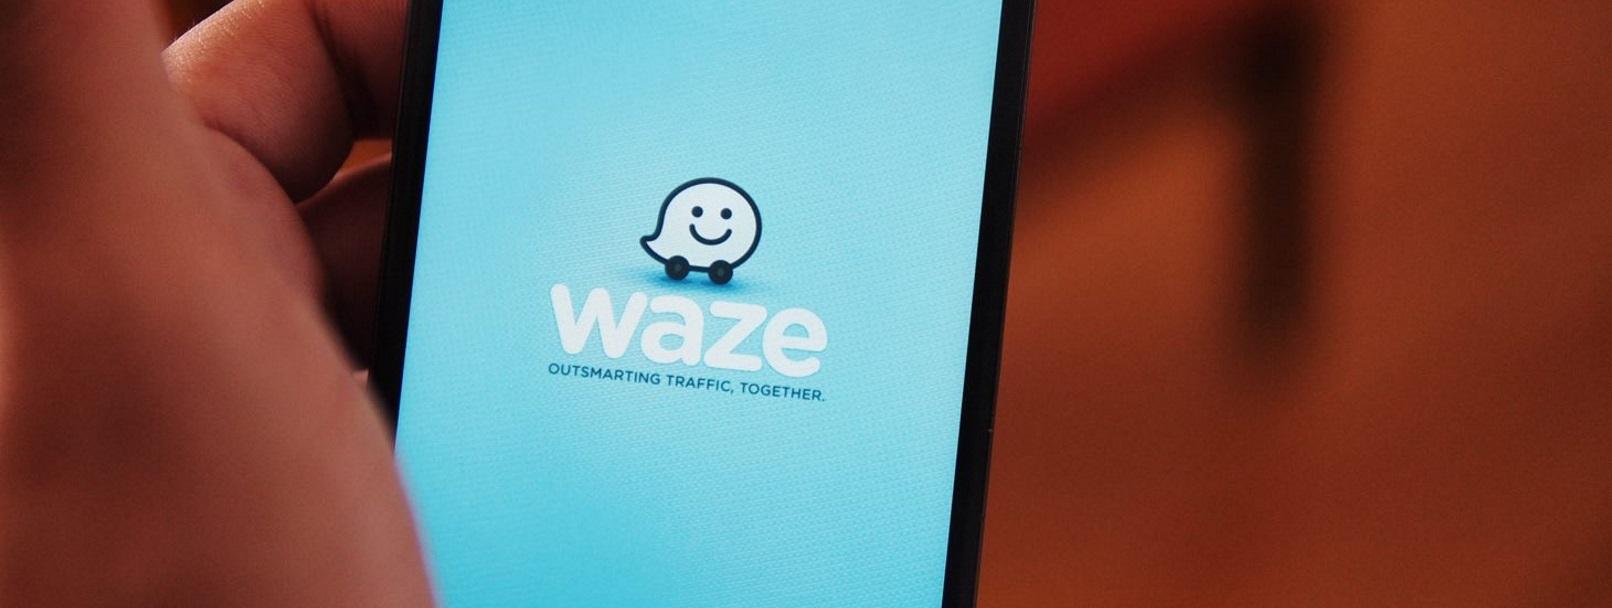 Google's navigation app Waze opens up its first carpooling trials